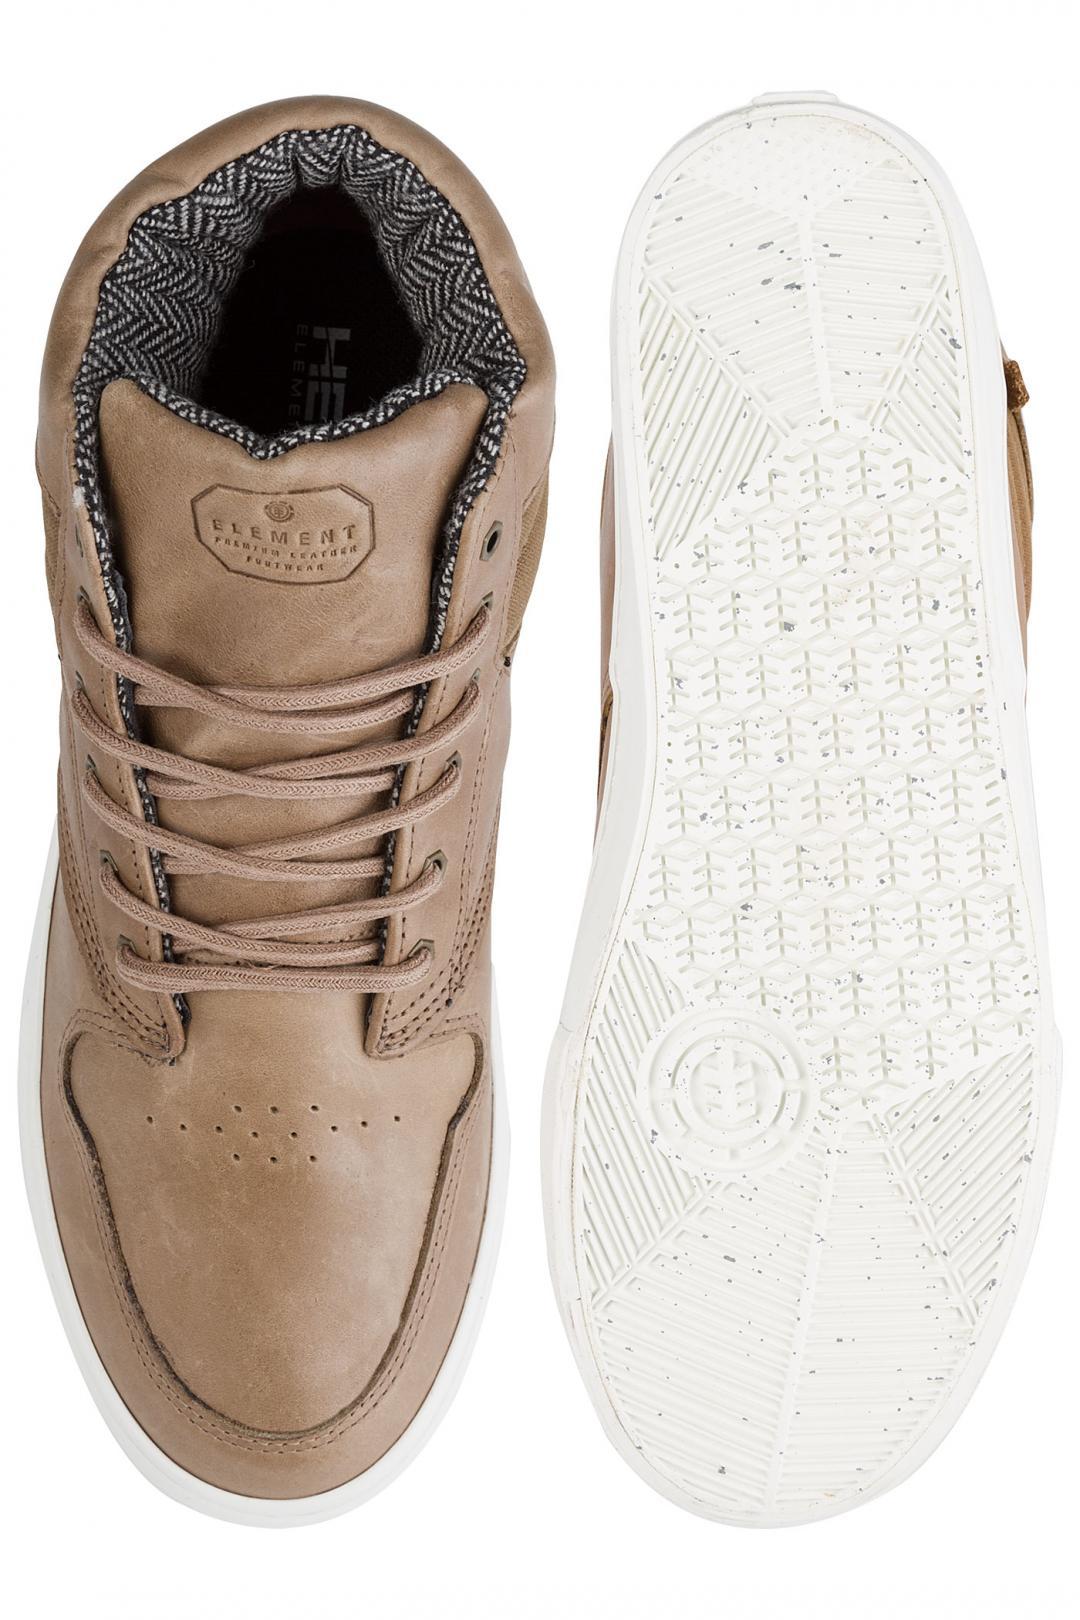 Uomo Element Topaz C3 Mid walnut premium   Sneaker